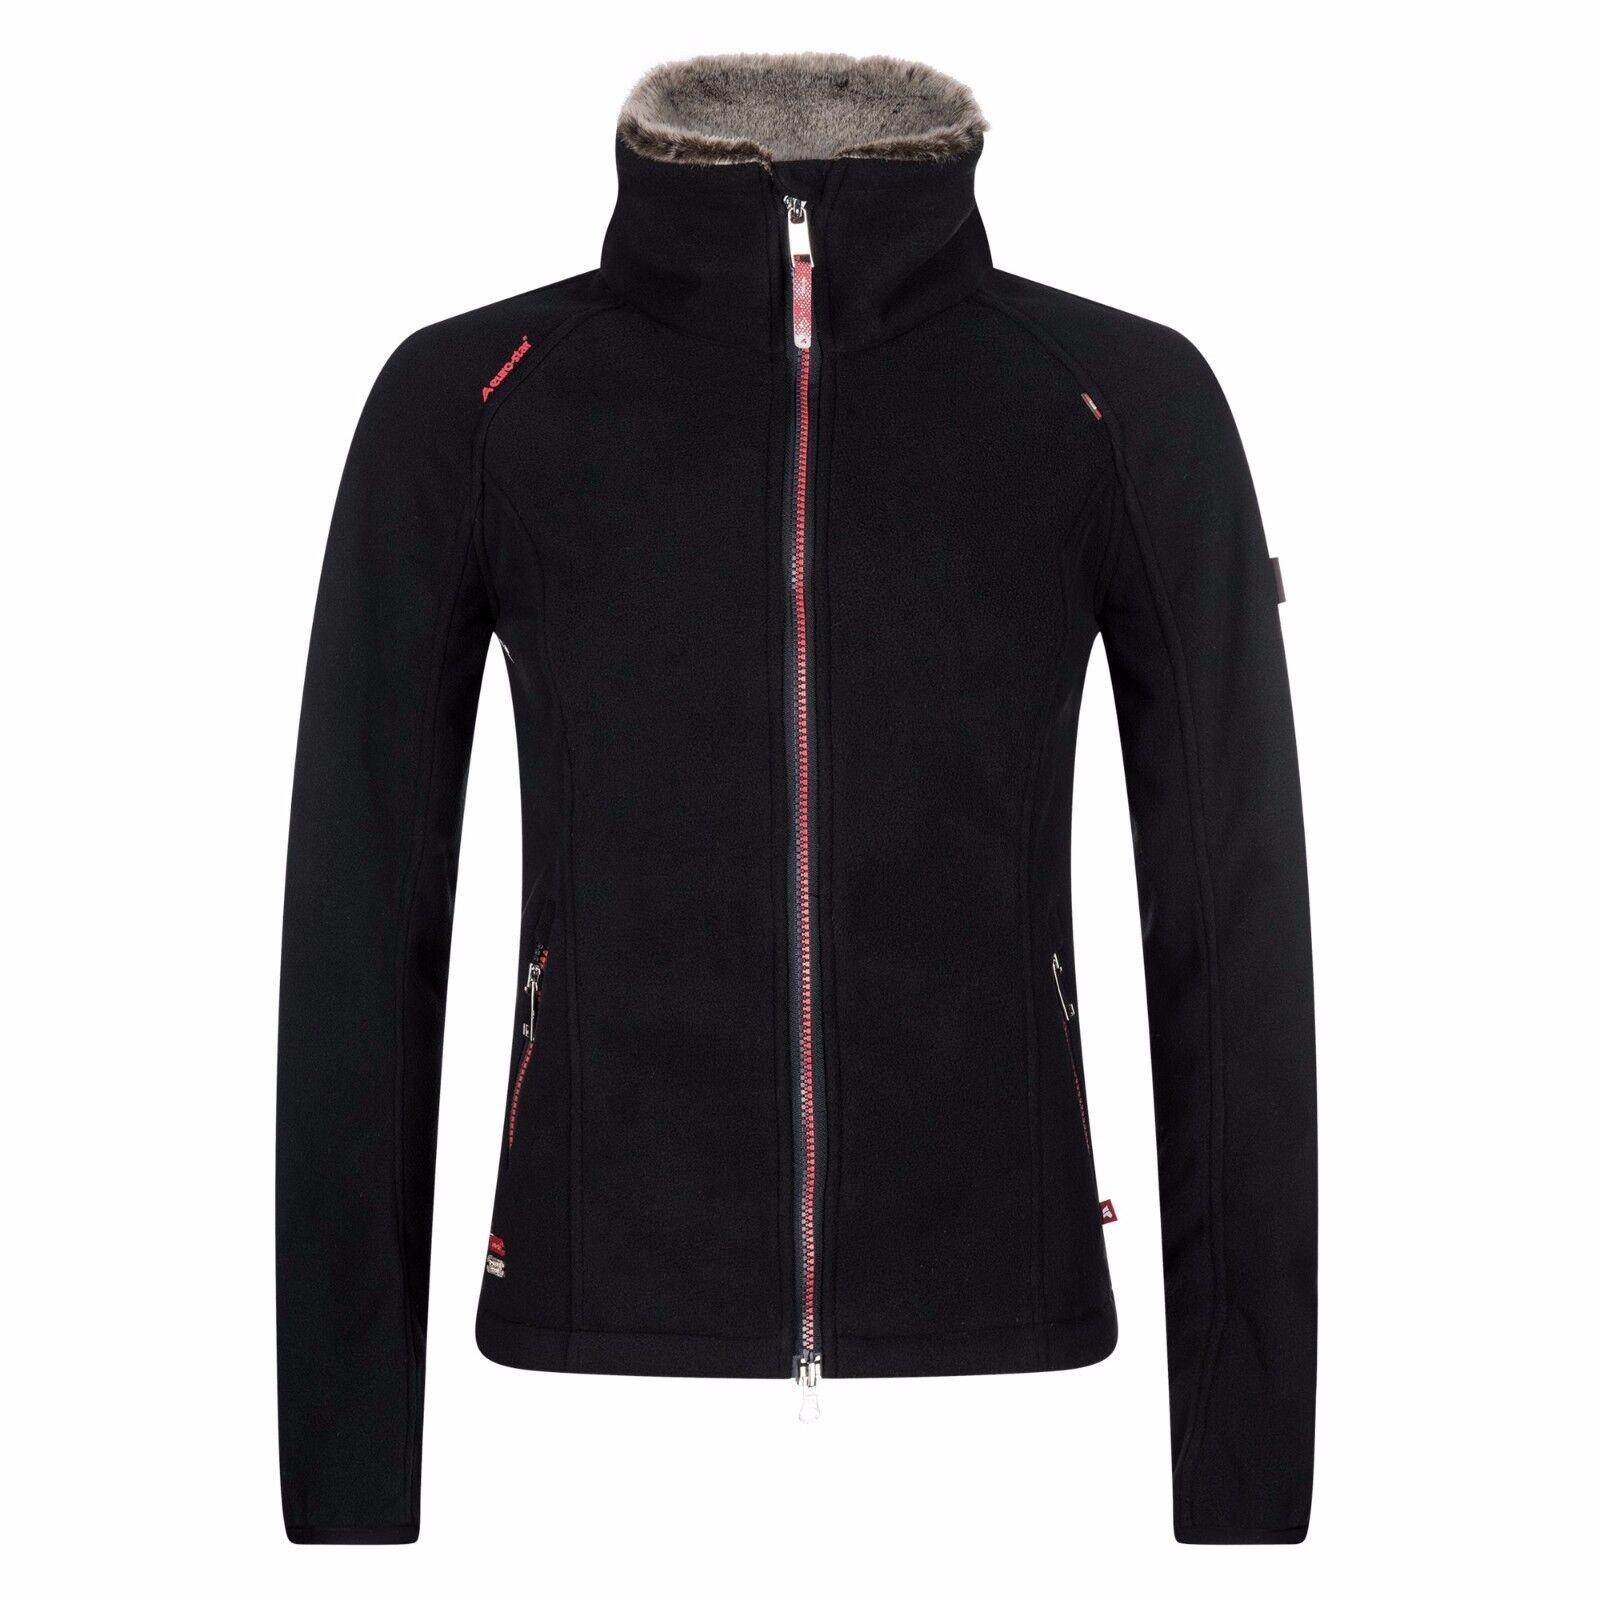 Euro Star señora Fleece chaqueta valmira, negro, talla XL nuevo    otoño invierno 2017